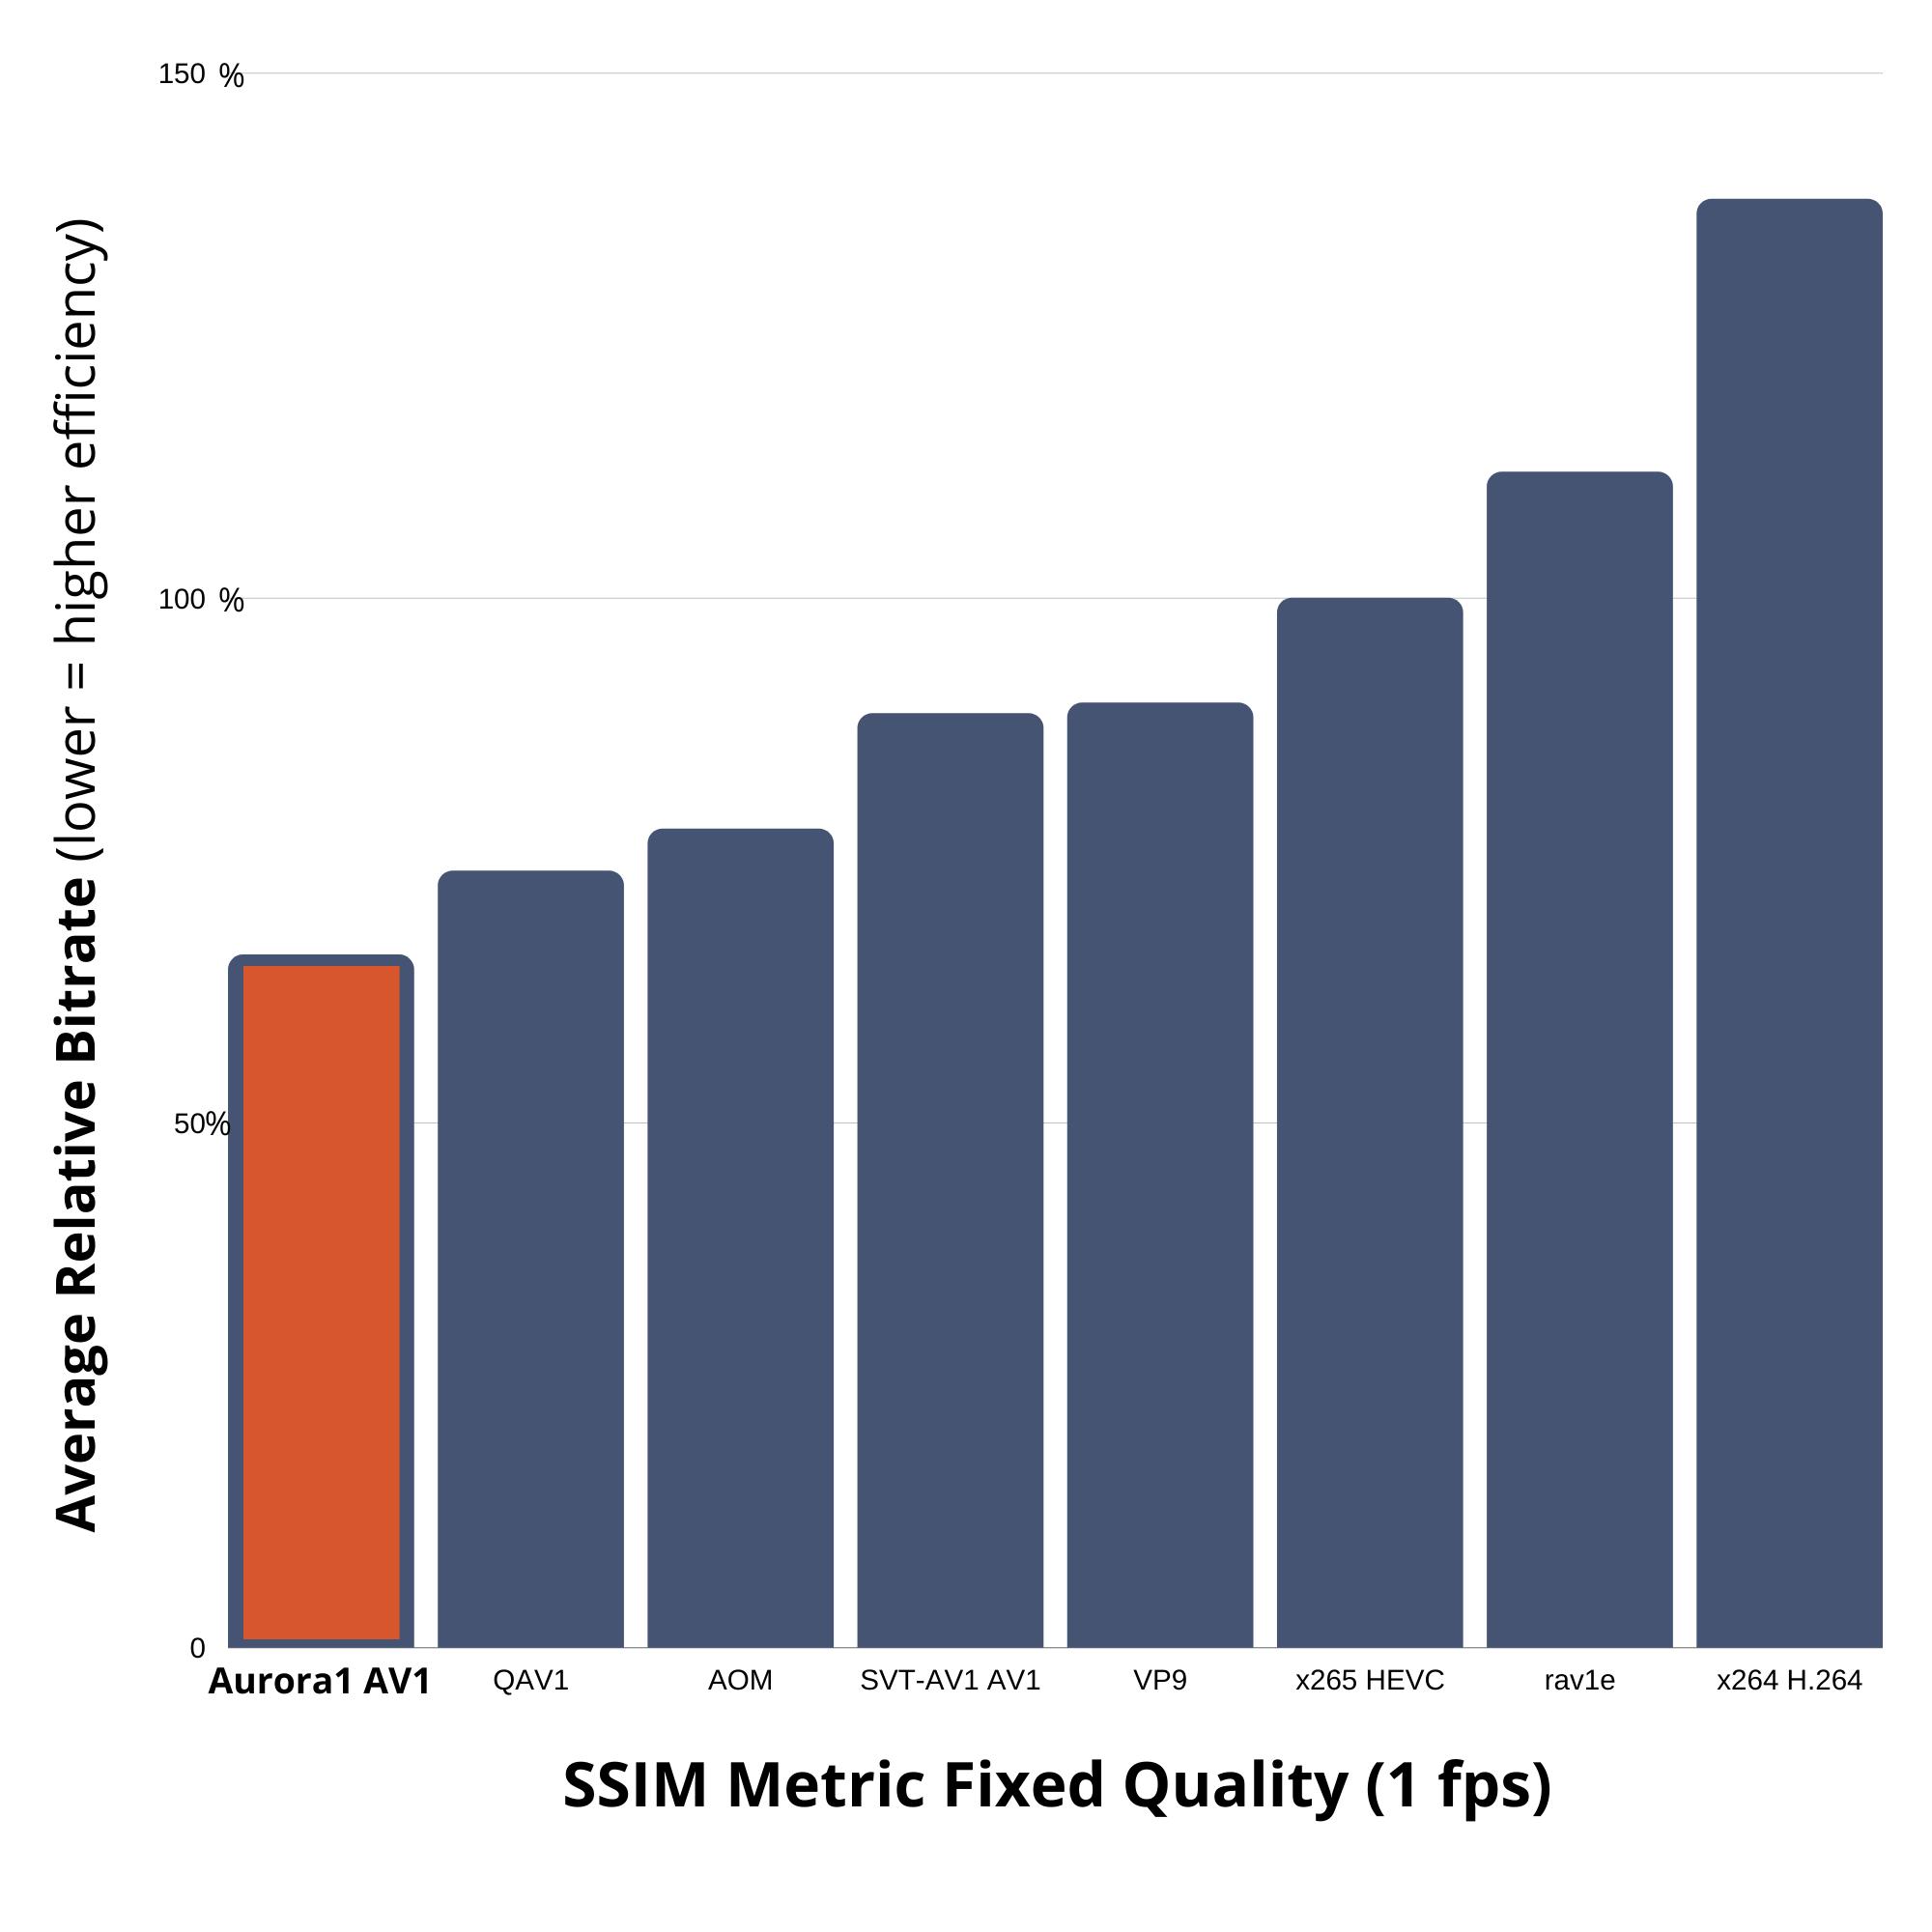 msu 2020 codec study ssim visionular aurora1 av1 encoder